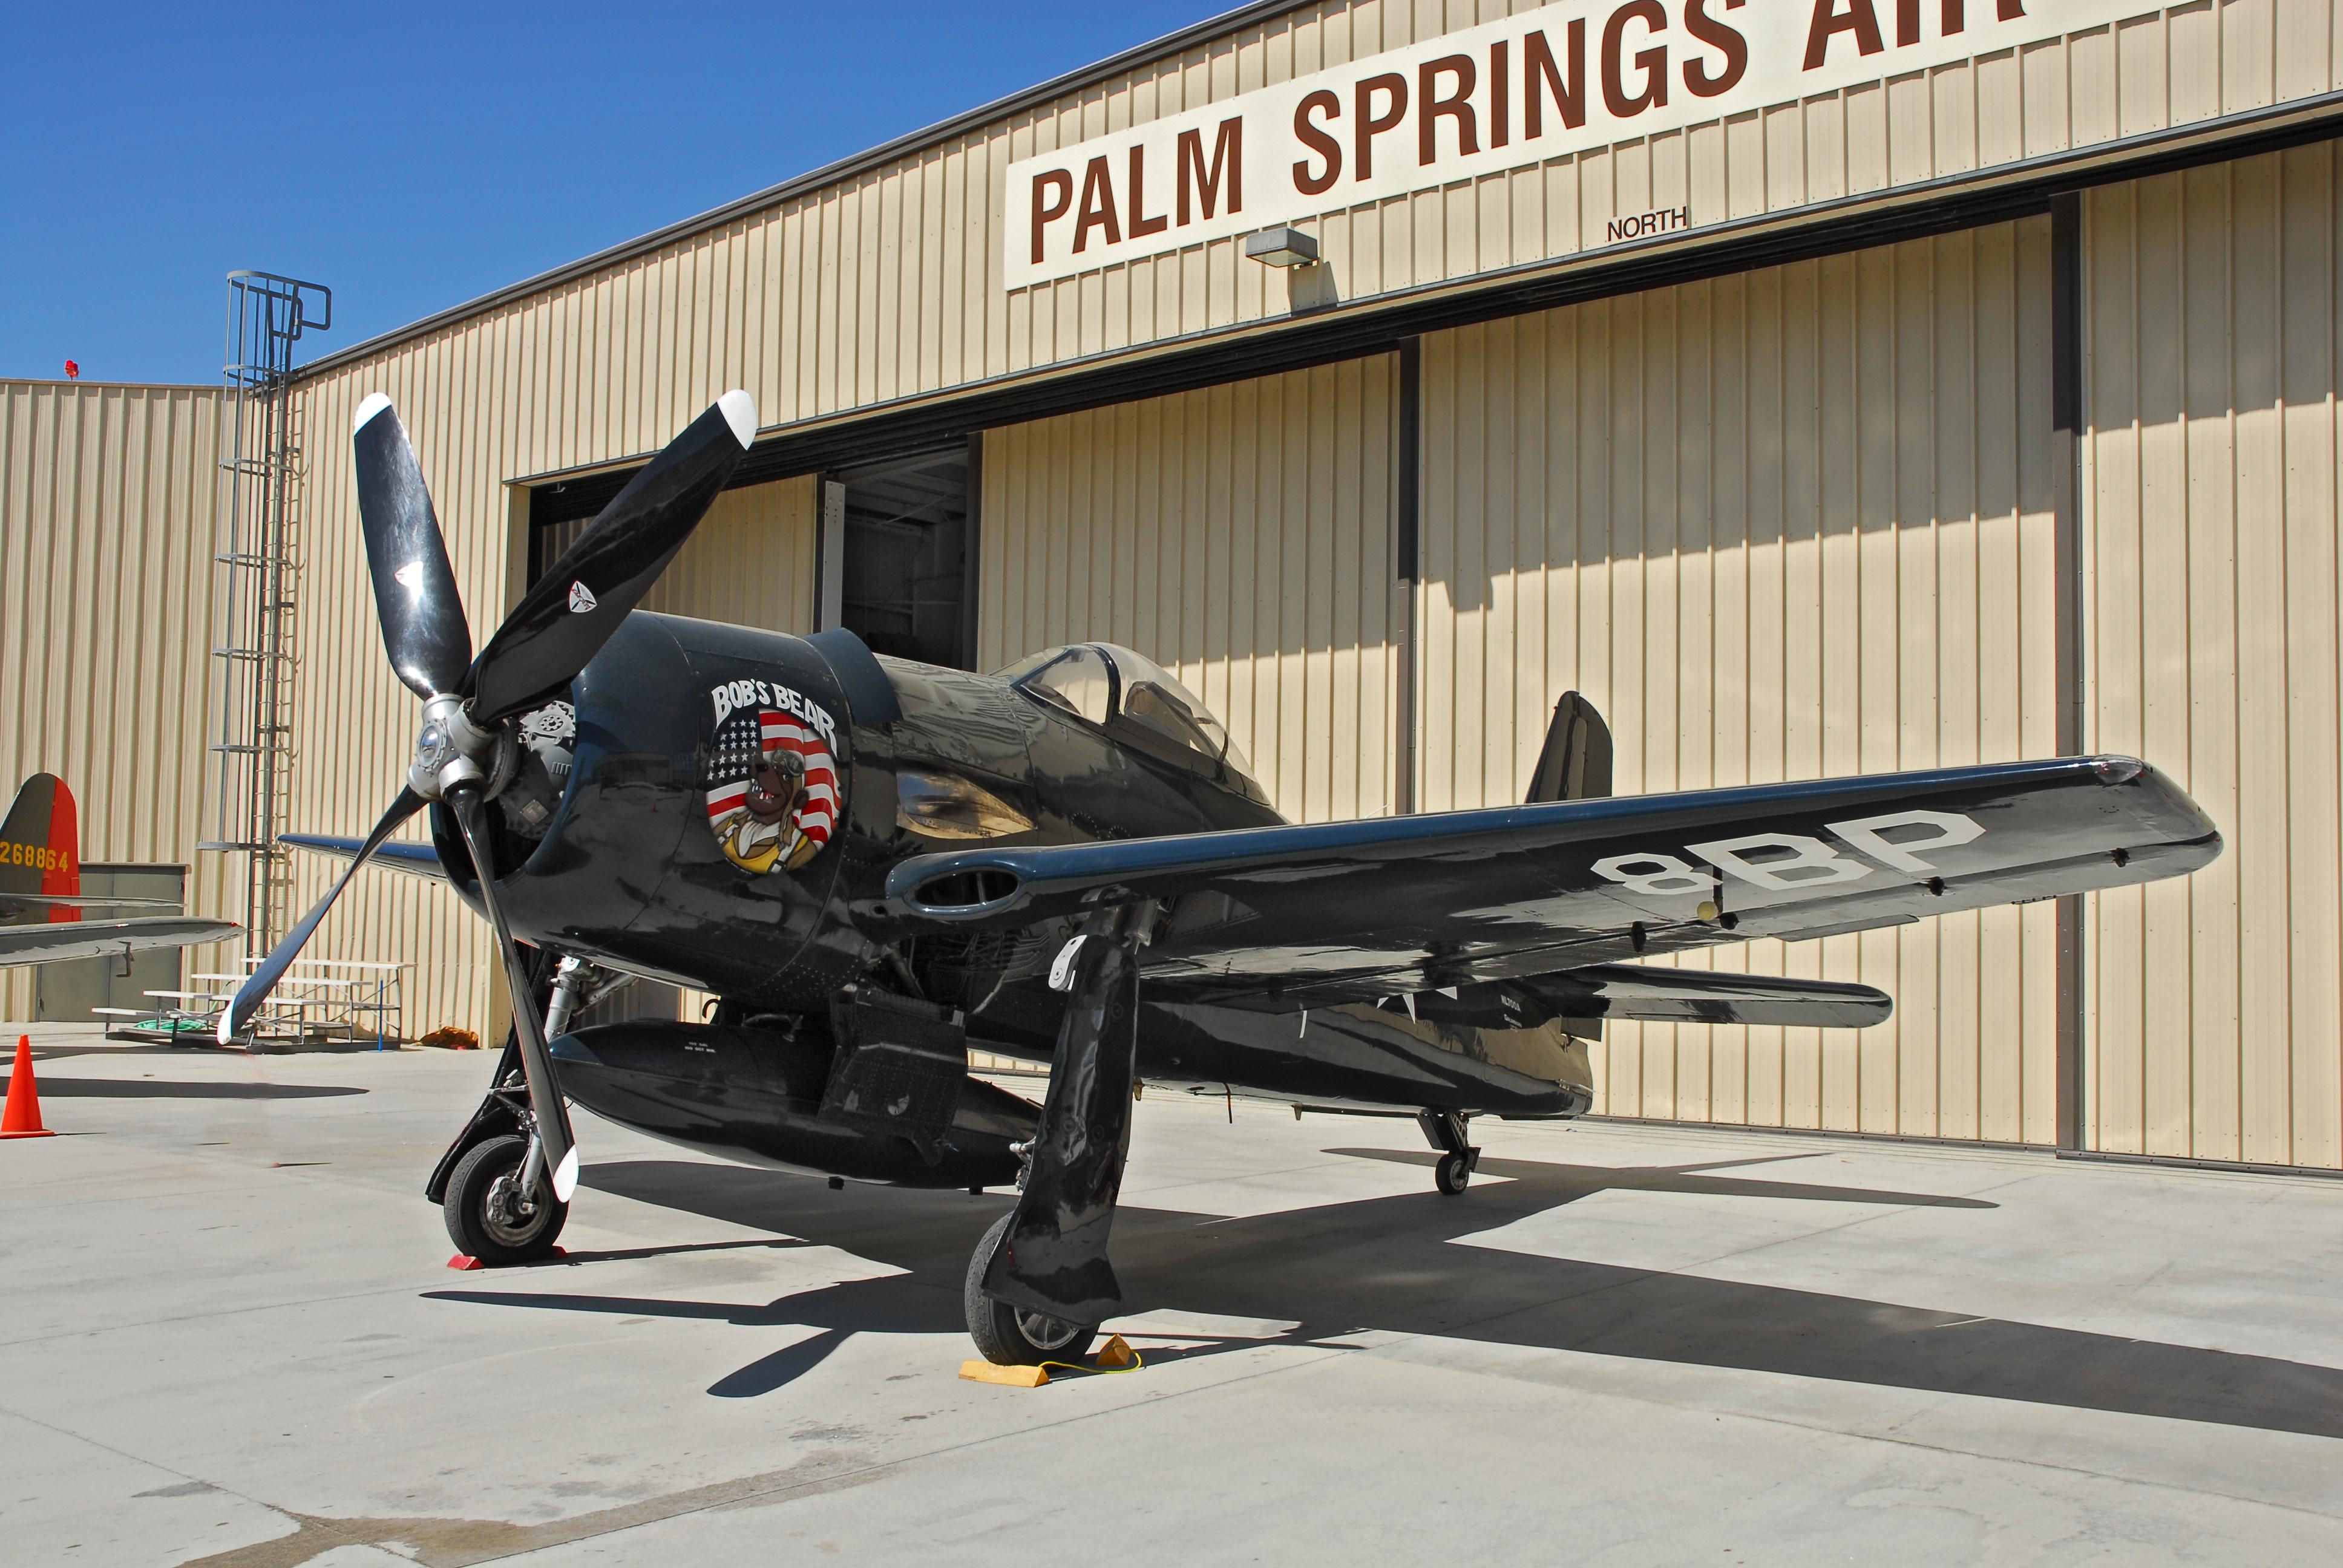 Palm Springs Air Museum - Wikipedia